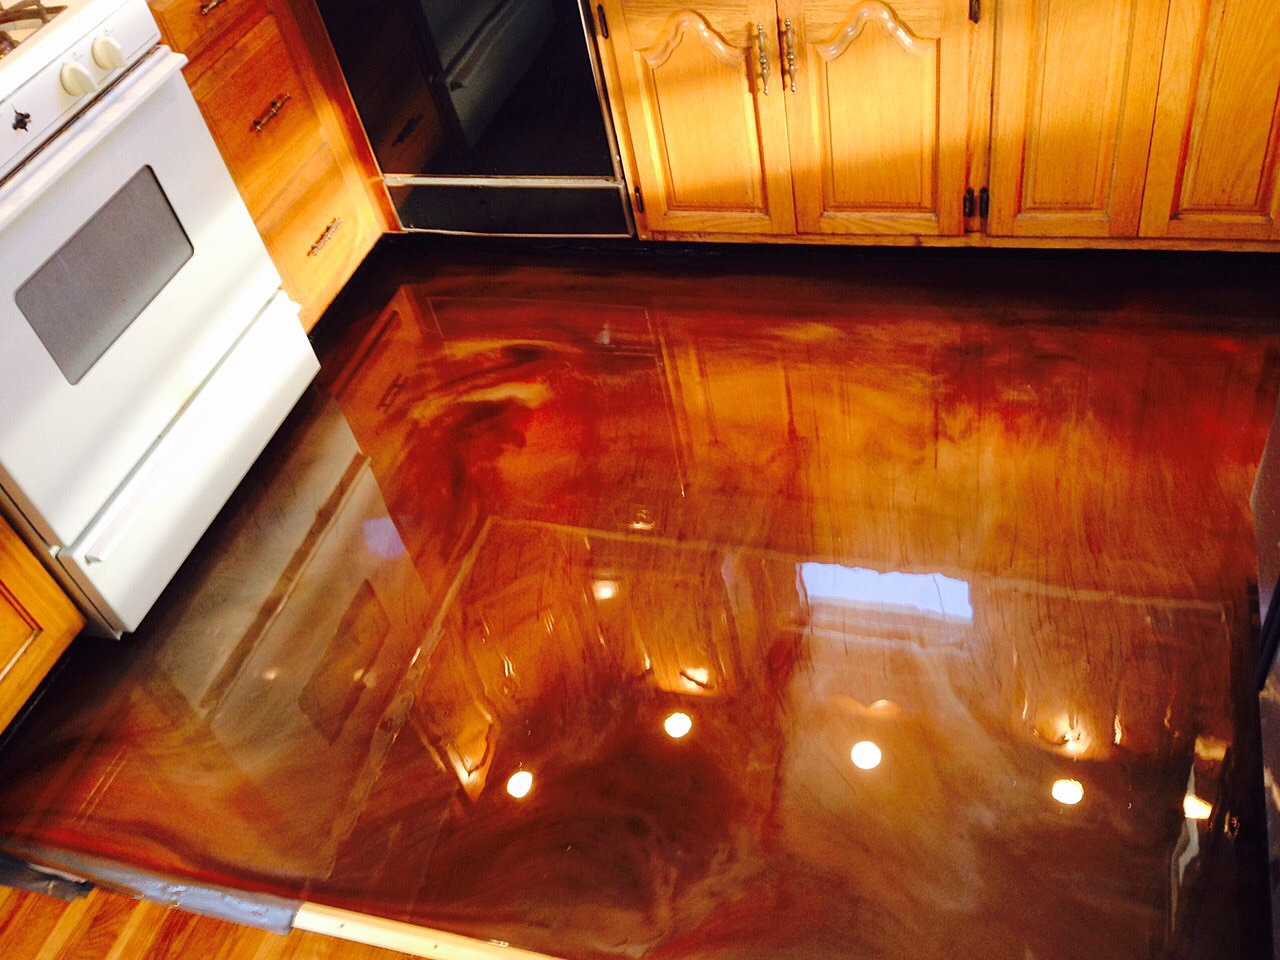 Epoxy Kitchen Floor Commercial Residential Epoxy Flooring Contractor Palisades Nj